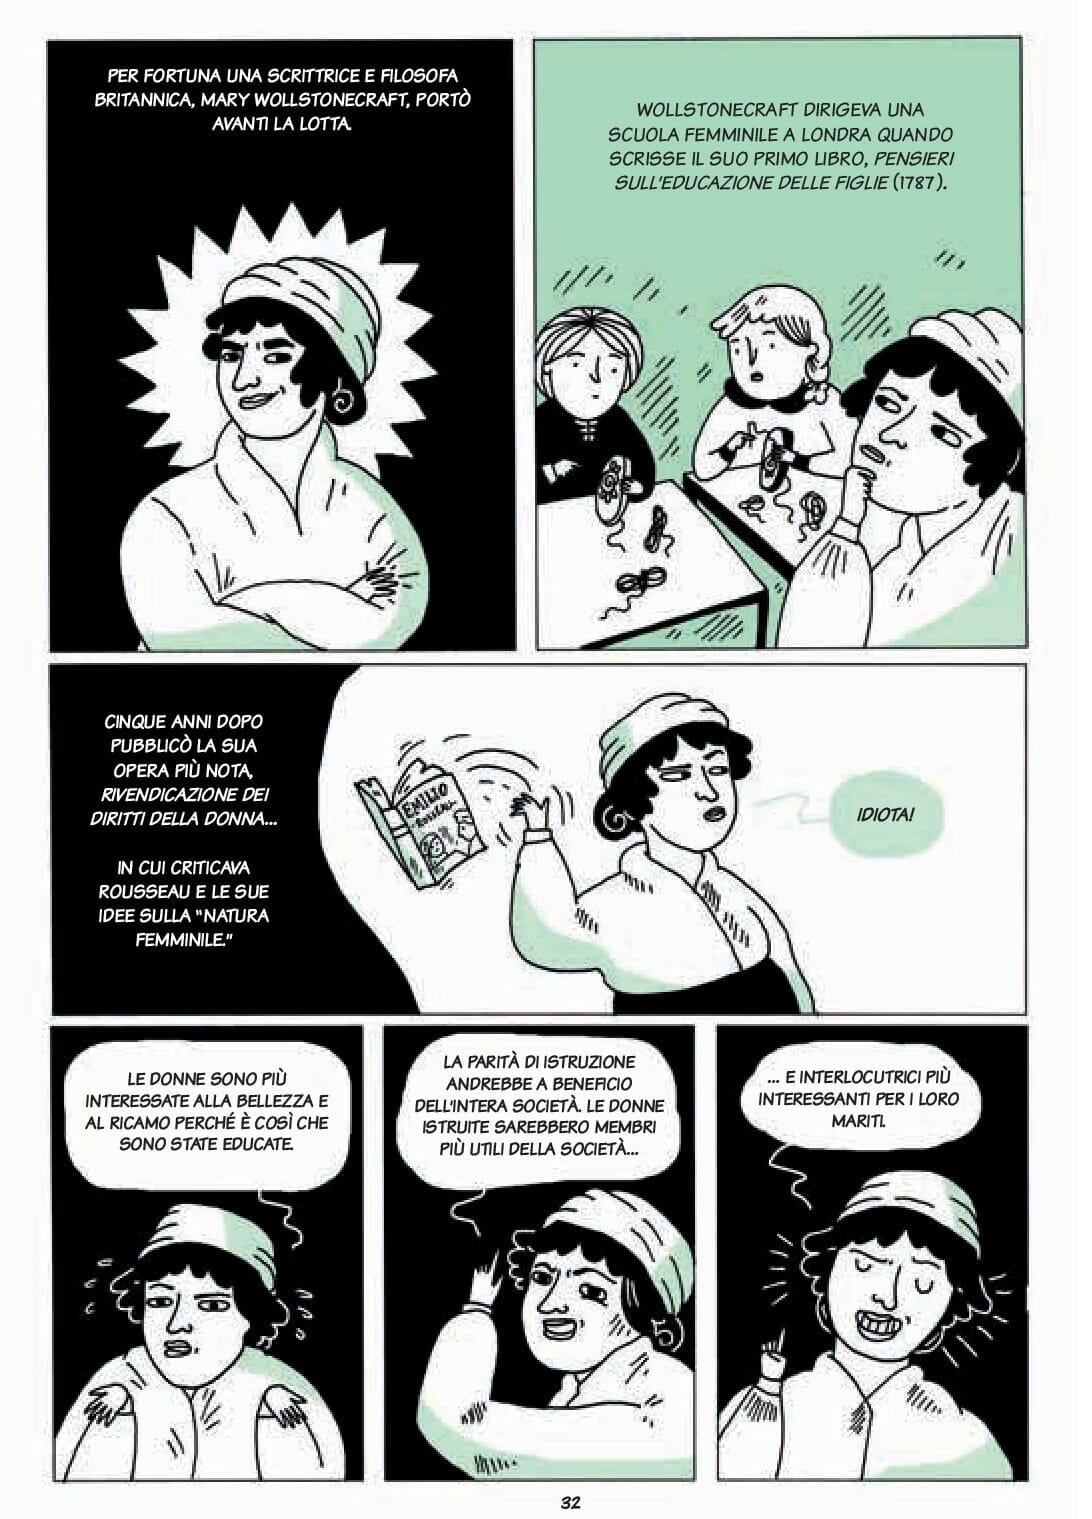 56cd8a4e52a1b Fumetti  storie di donne senza paura per celebrare 150 anni di lotte ...